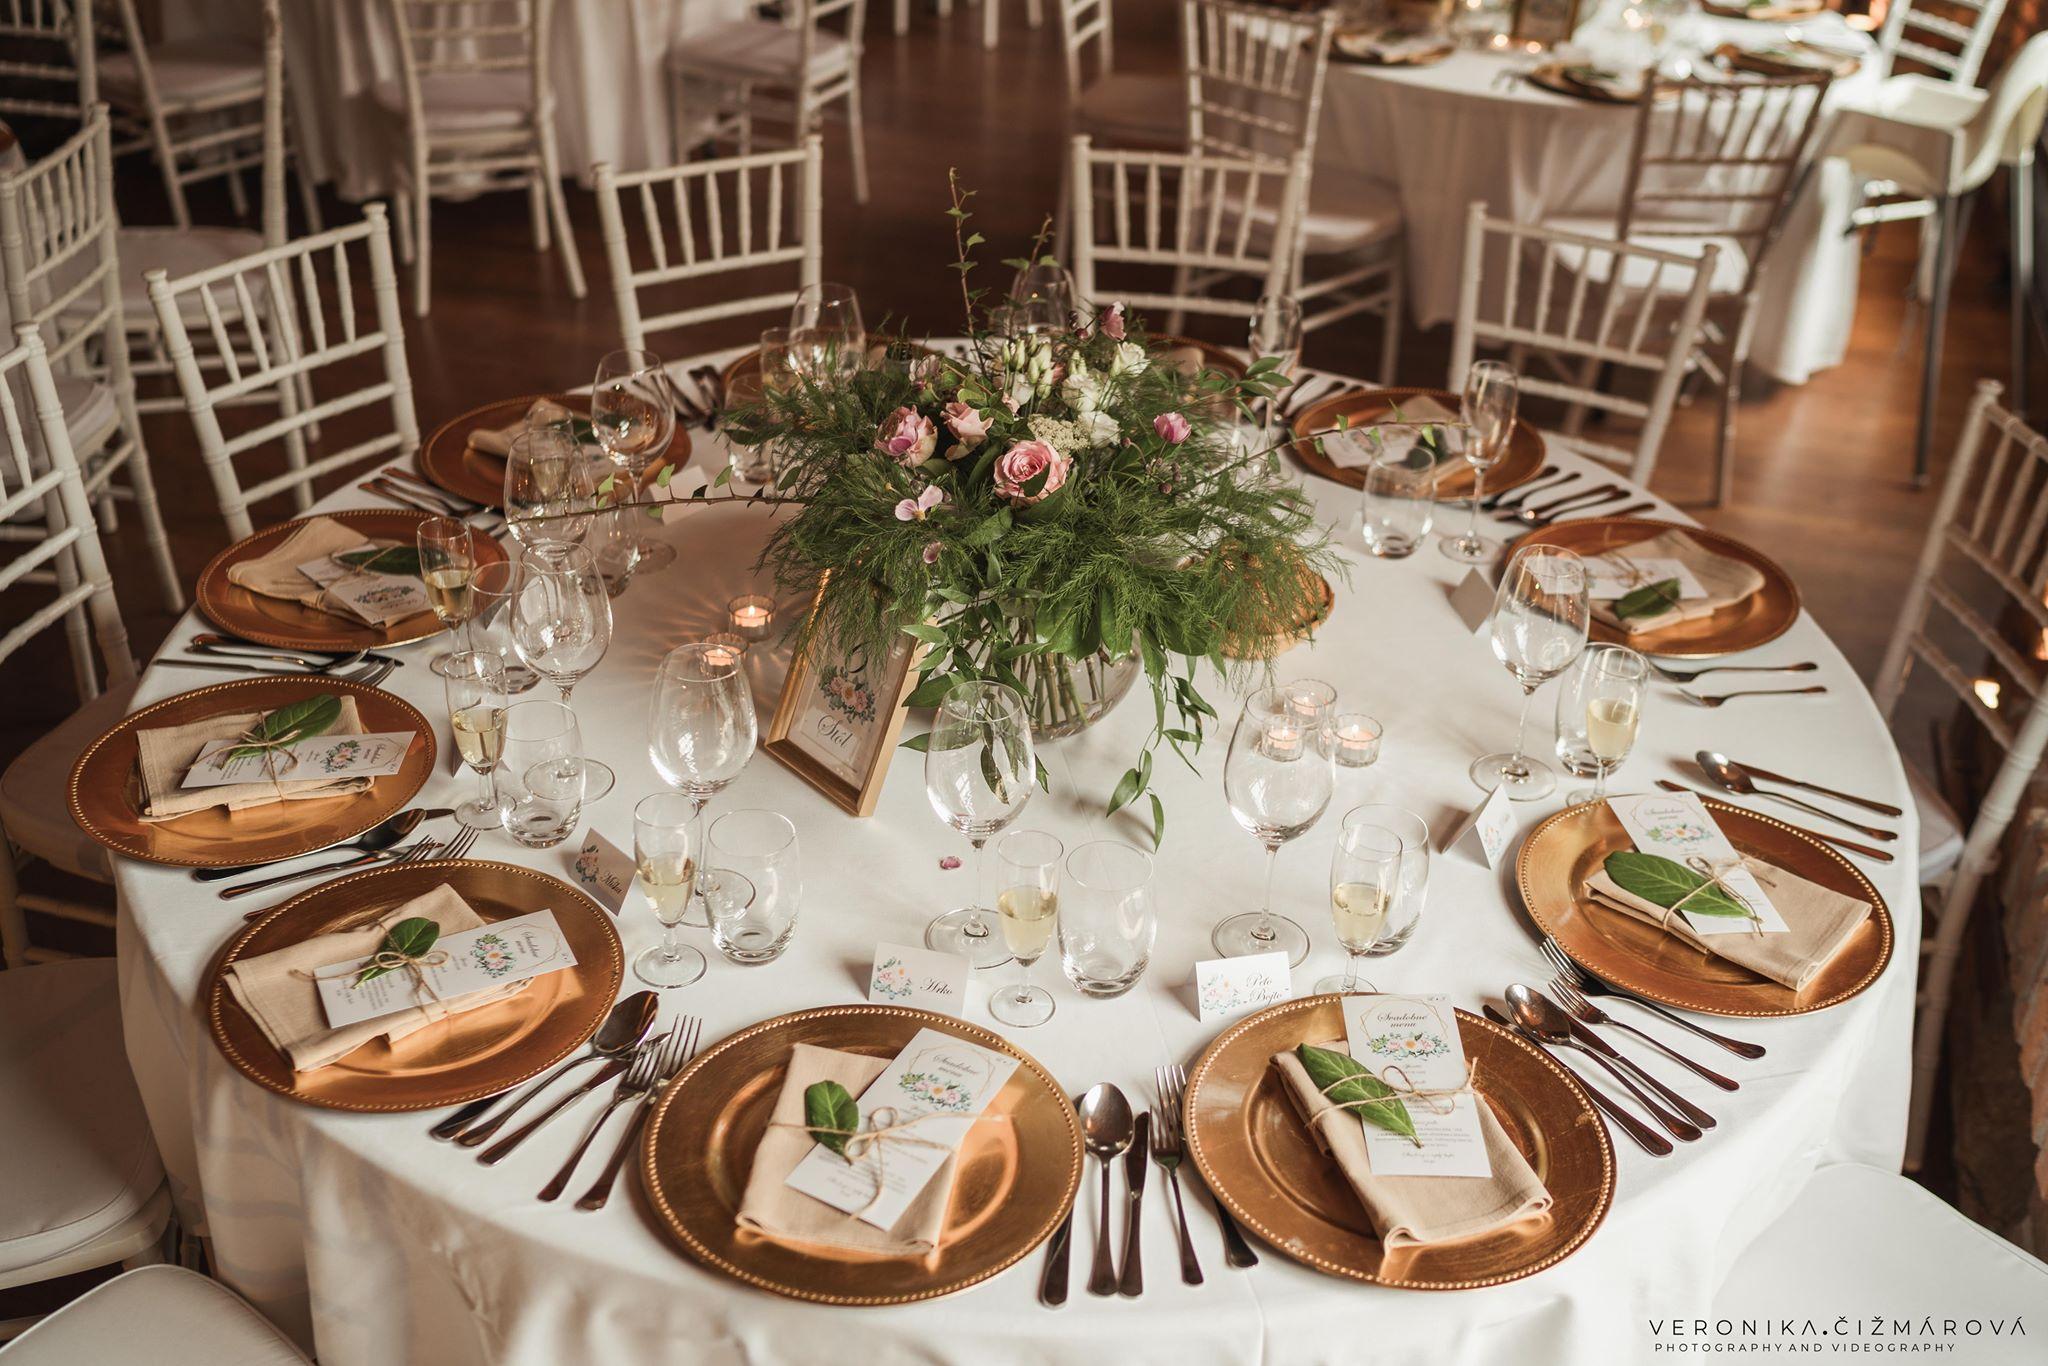 klubove-taniere-na-svadbu-vyzdoba-chiavari-monovky-pozvankyjpg